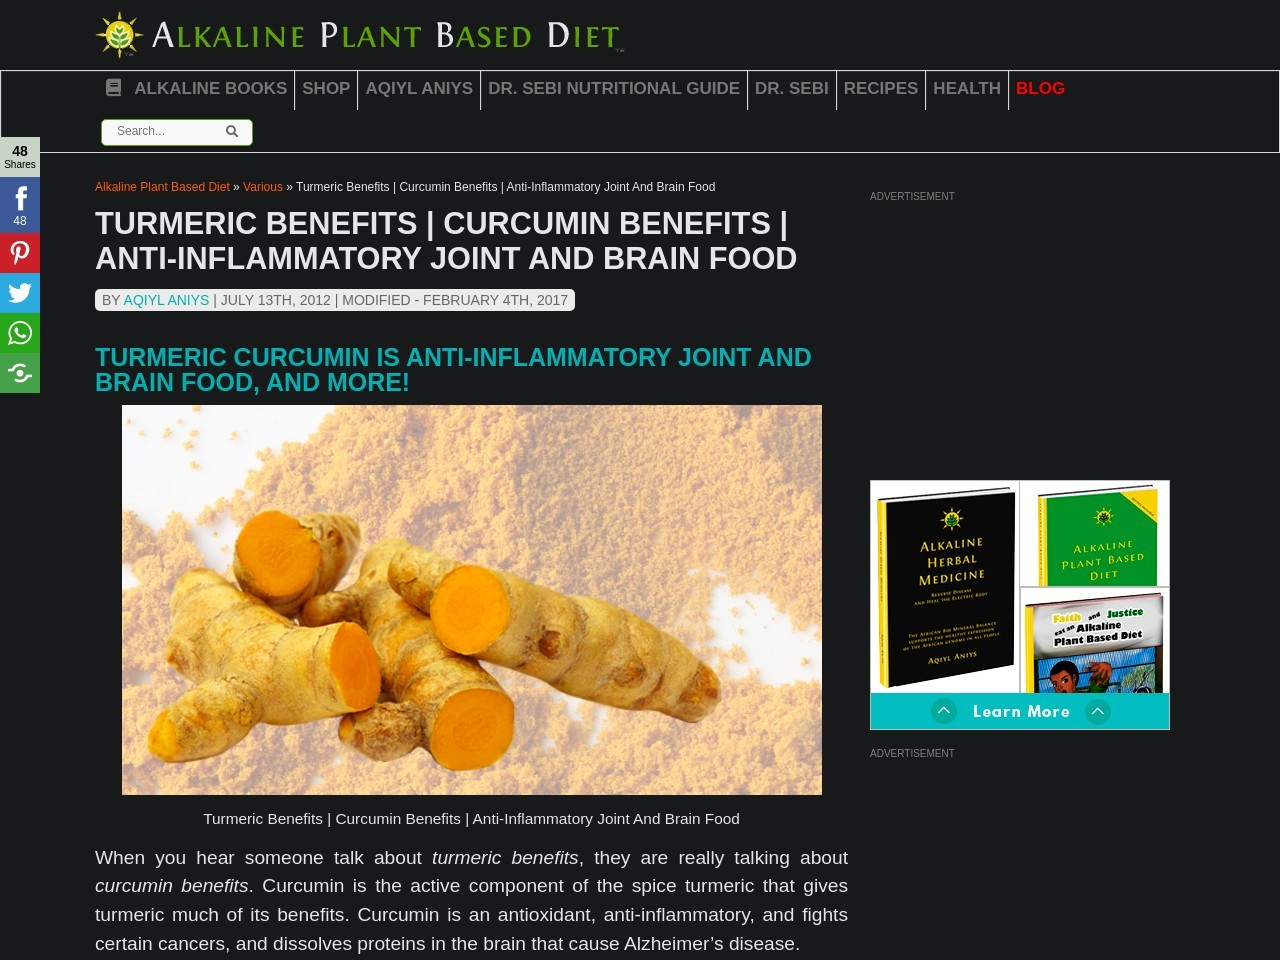 Turmeric Benefits | Curcumin Benefits – Natural Life Energy